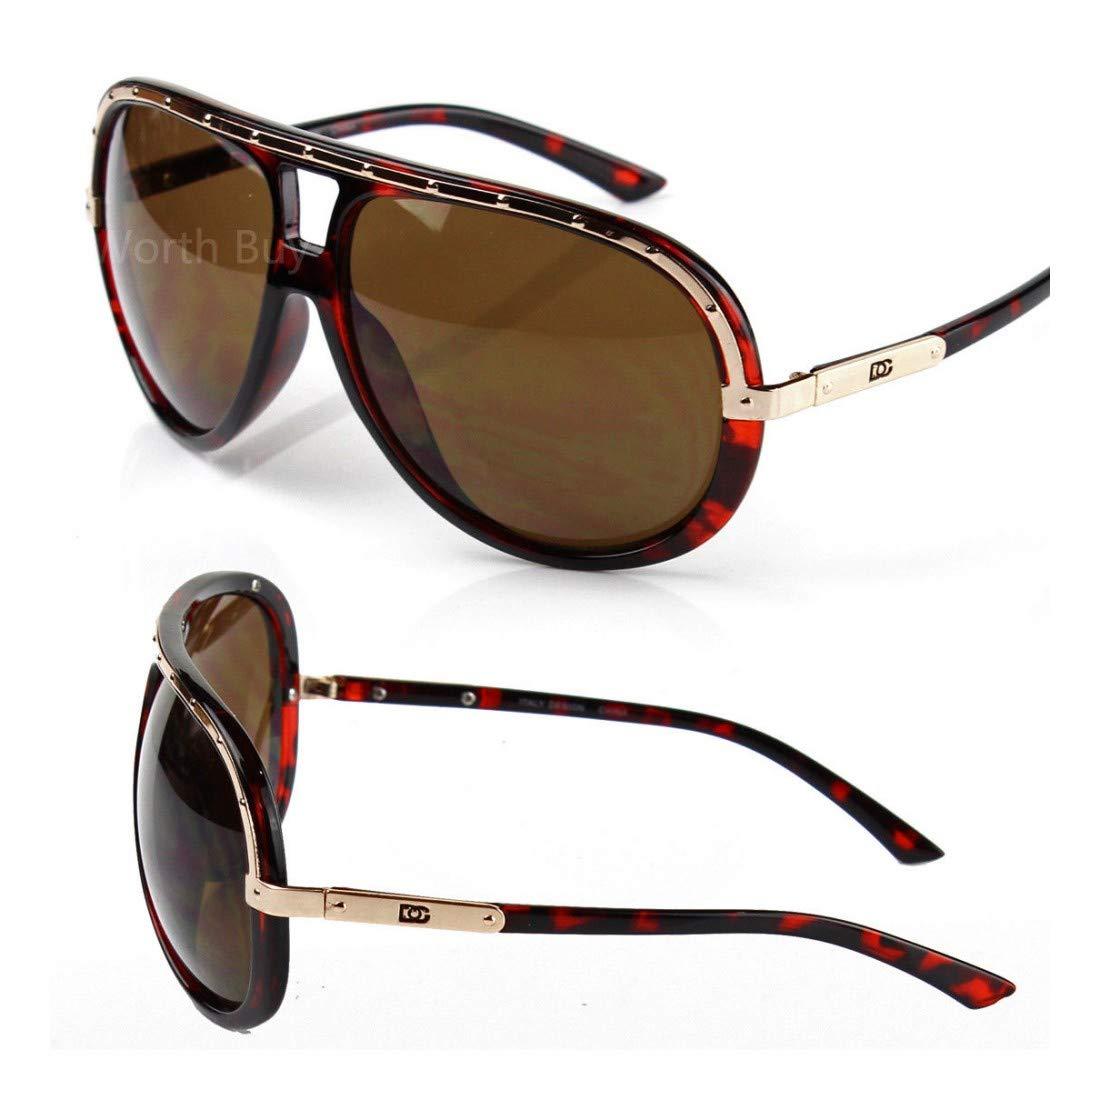 DG Eyewear Mens Sunglasses Shades Designer Camo Gold Pilot Wrap Turbo Large